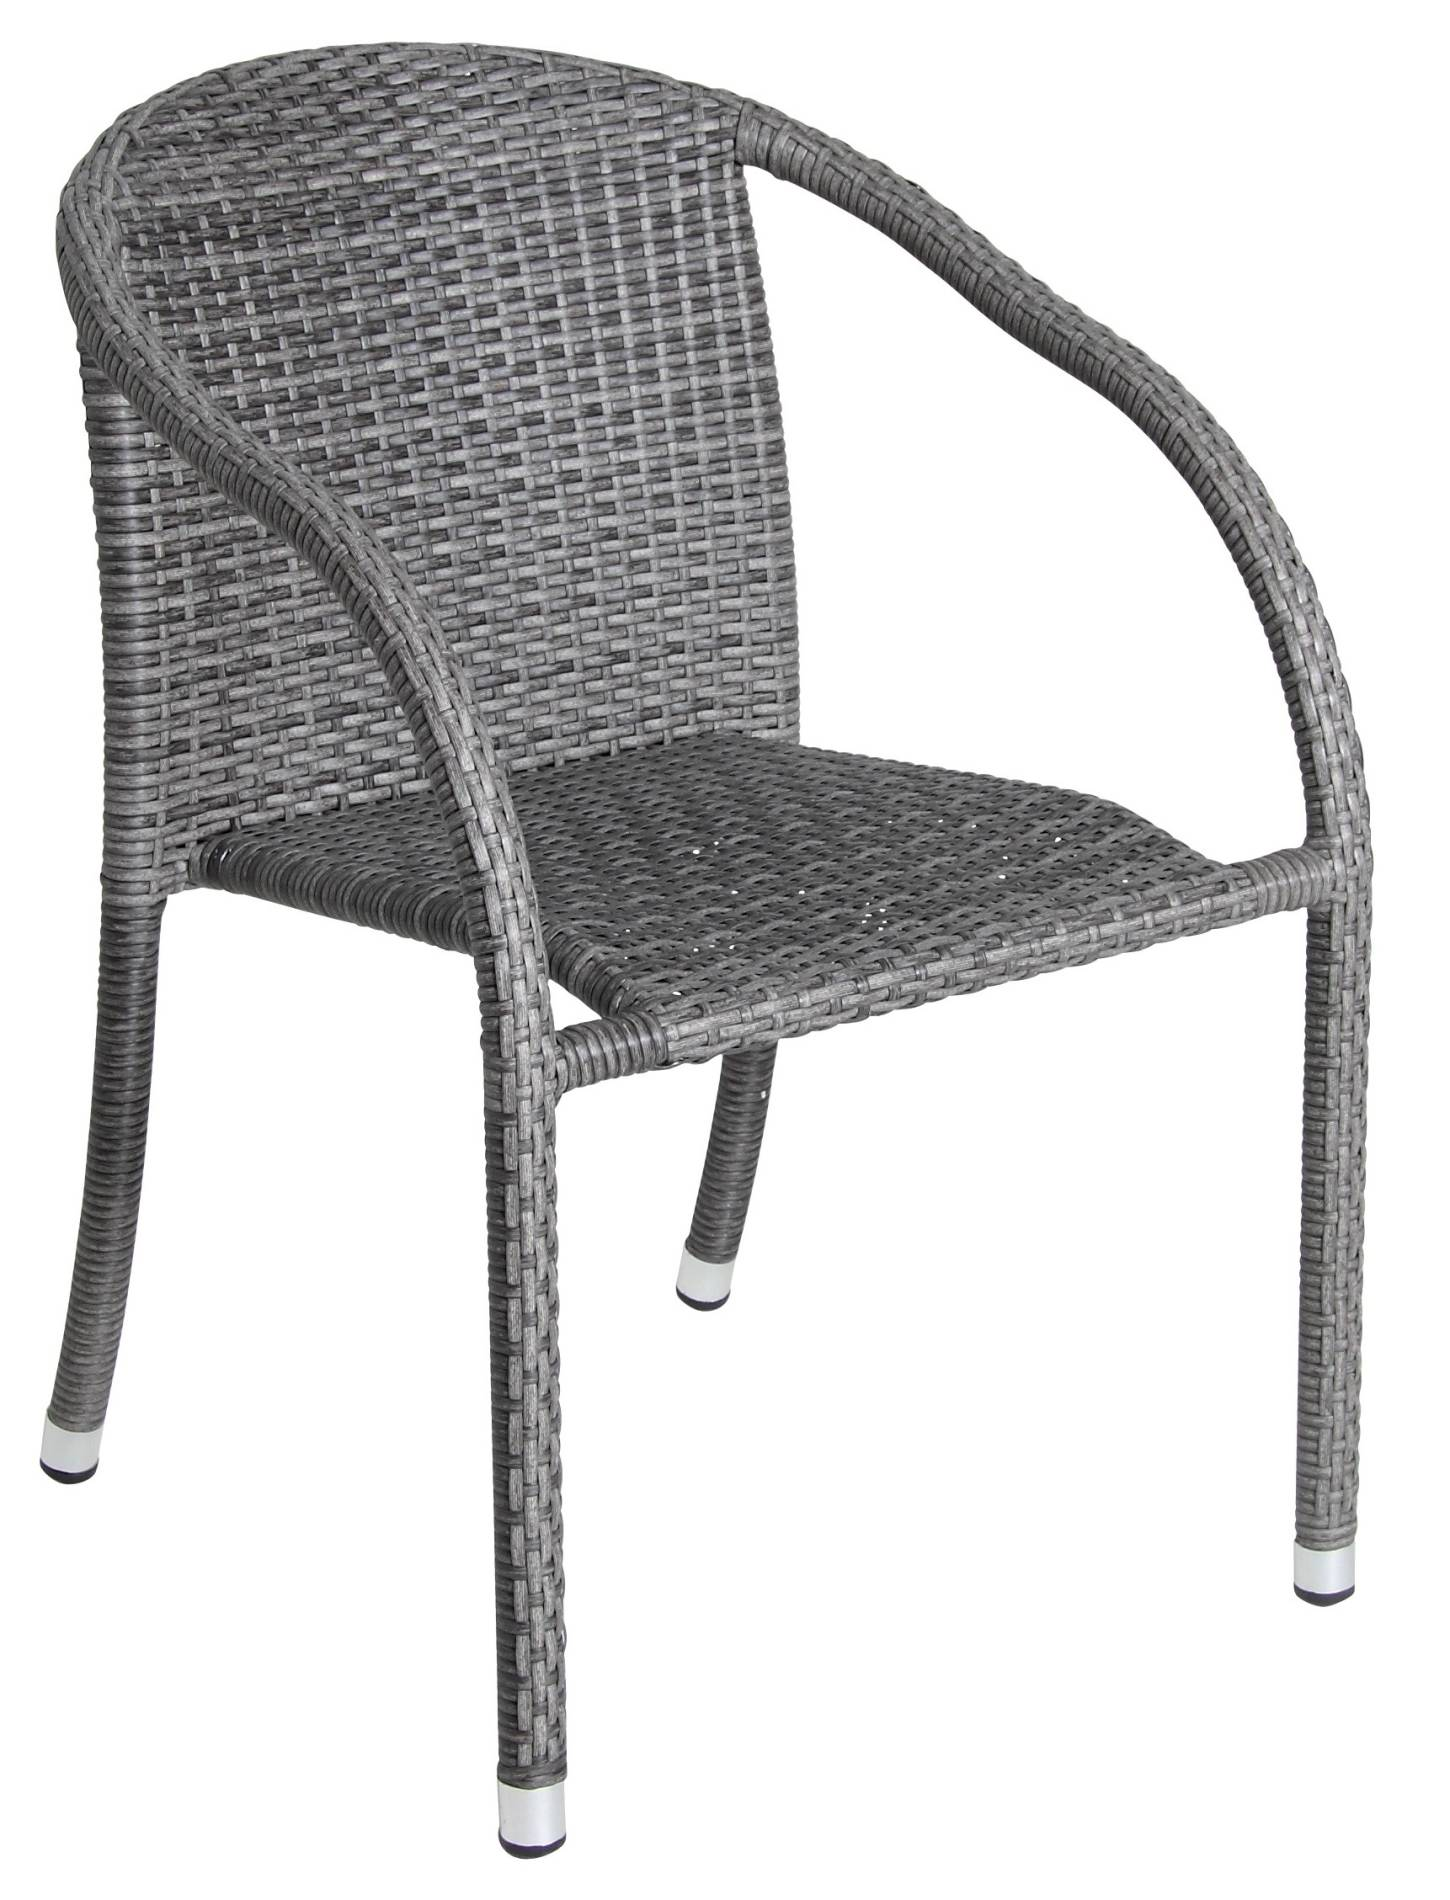 acamp Bistrosessel Savona 56414 Aluminium rundes Kunststoffgeflecht anthrazit